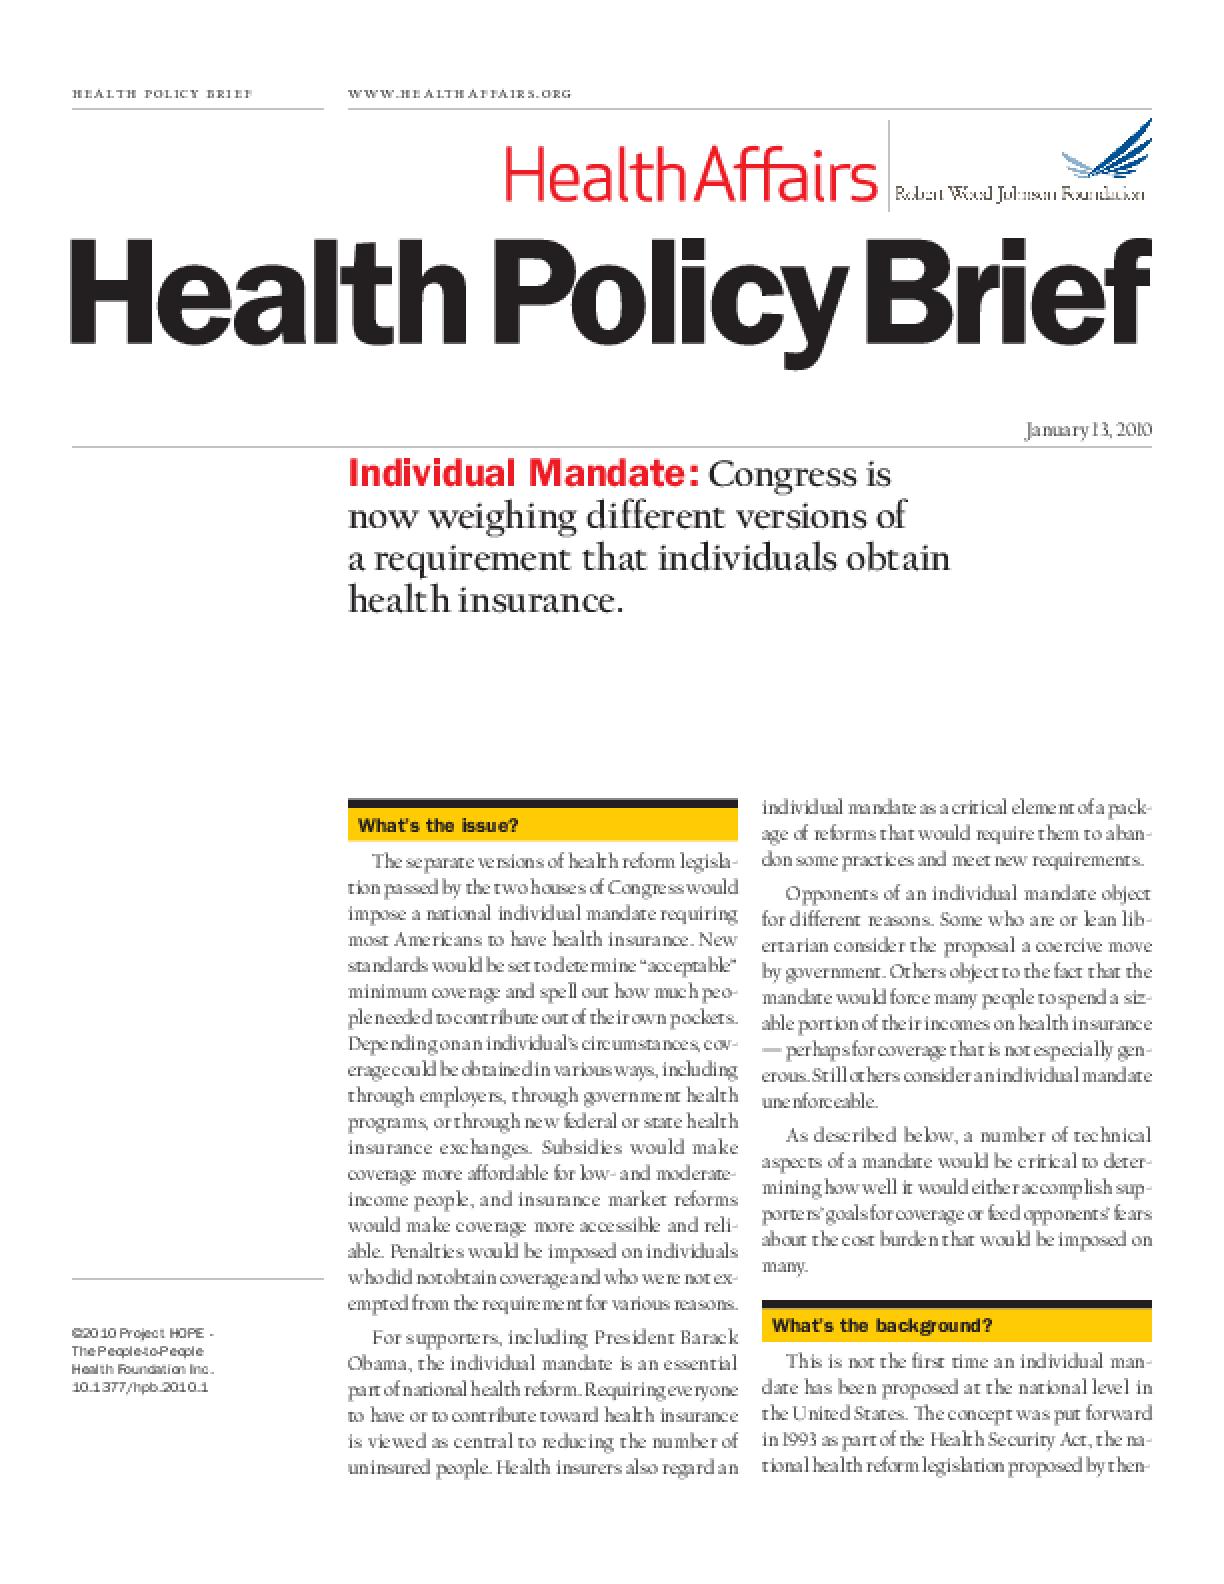 Health Affairs/RWJF Policy Brief: Individual Mandate